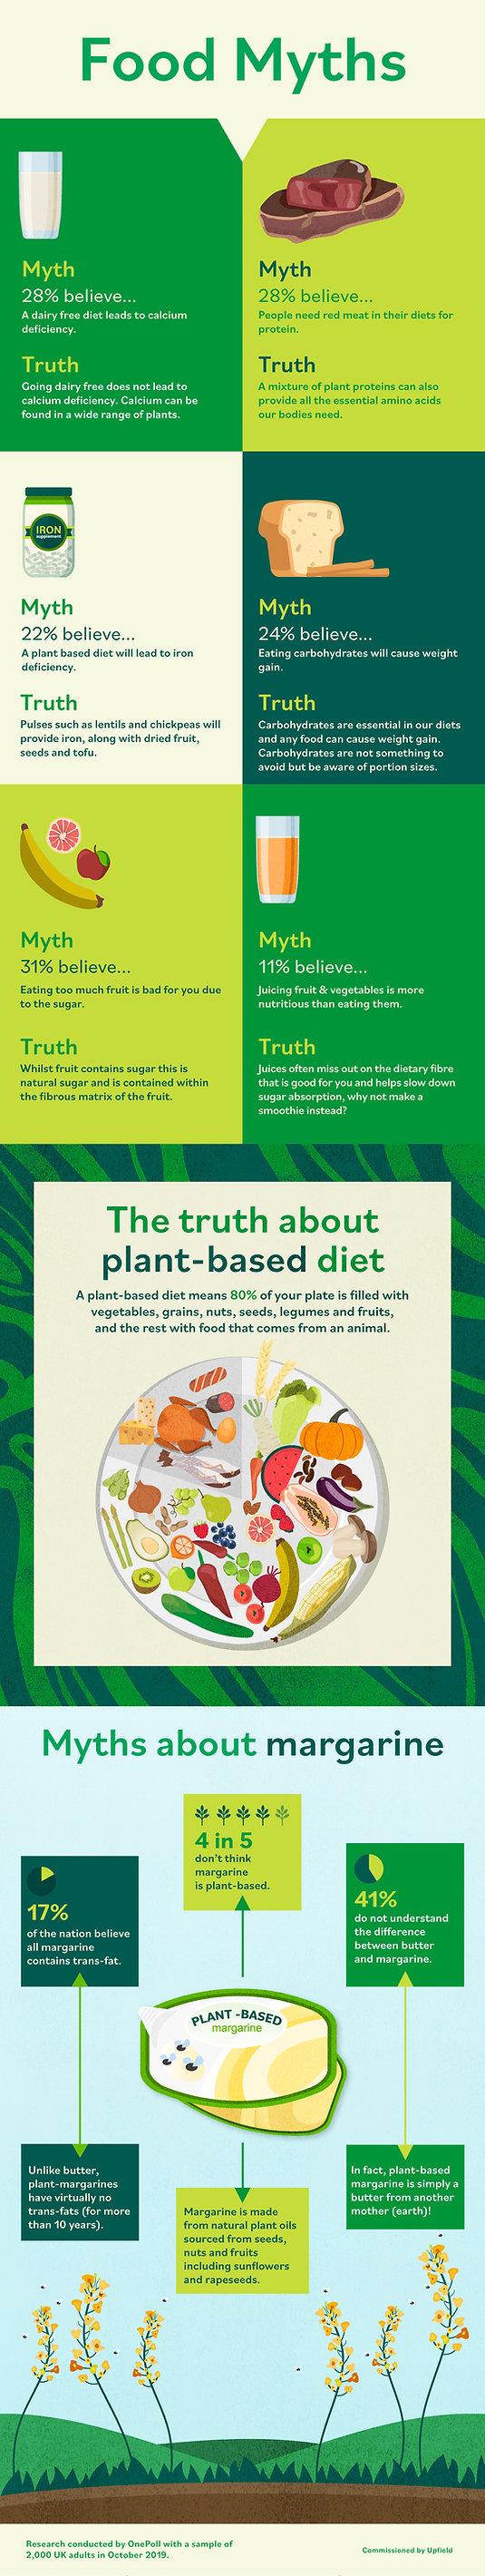 Upfield_Food-Myths_infog_UK.jpg